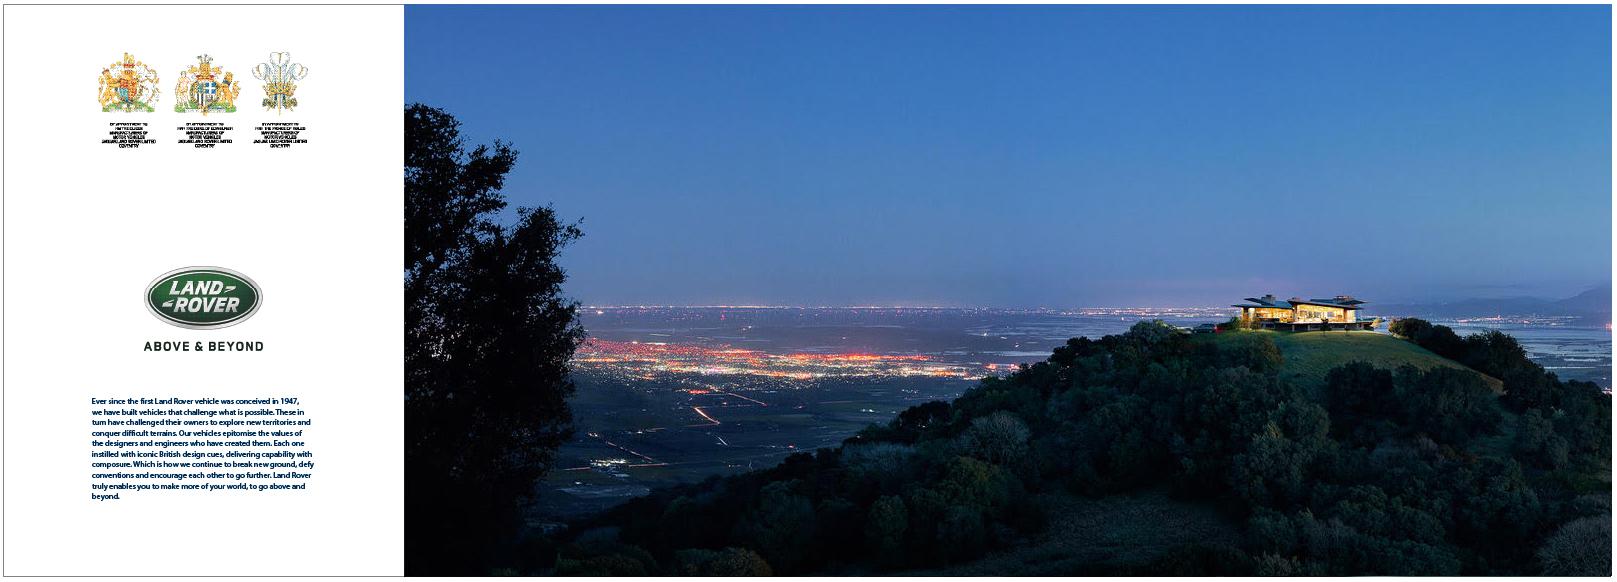 Richard Prescott / Spark 44. We shot the city lights at Twin Peaks in San Francisco.